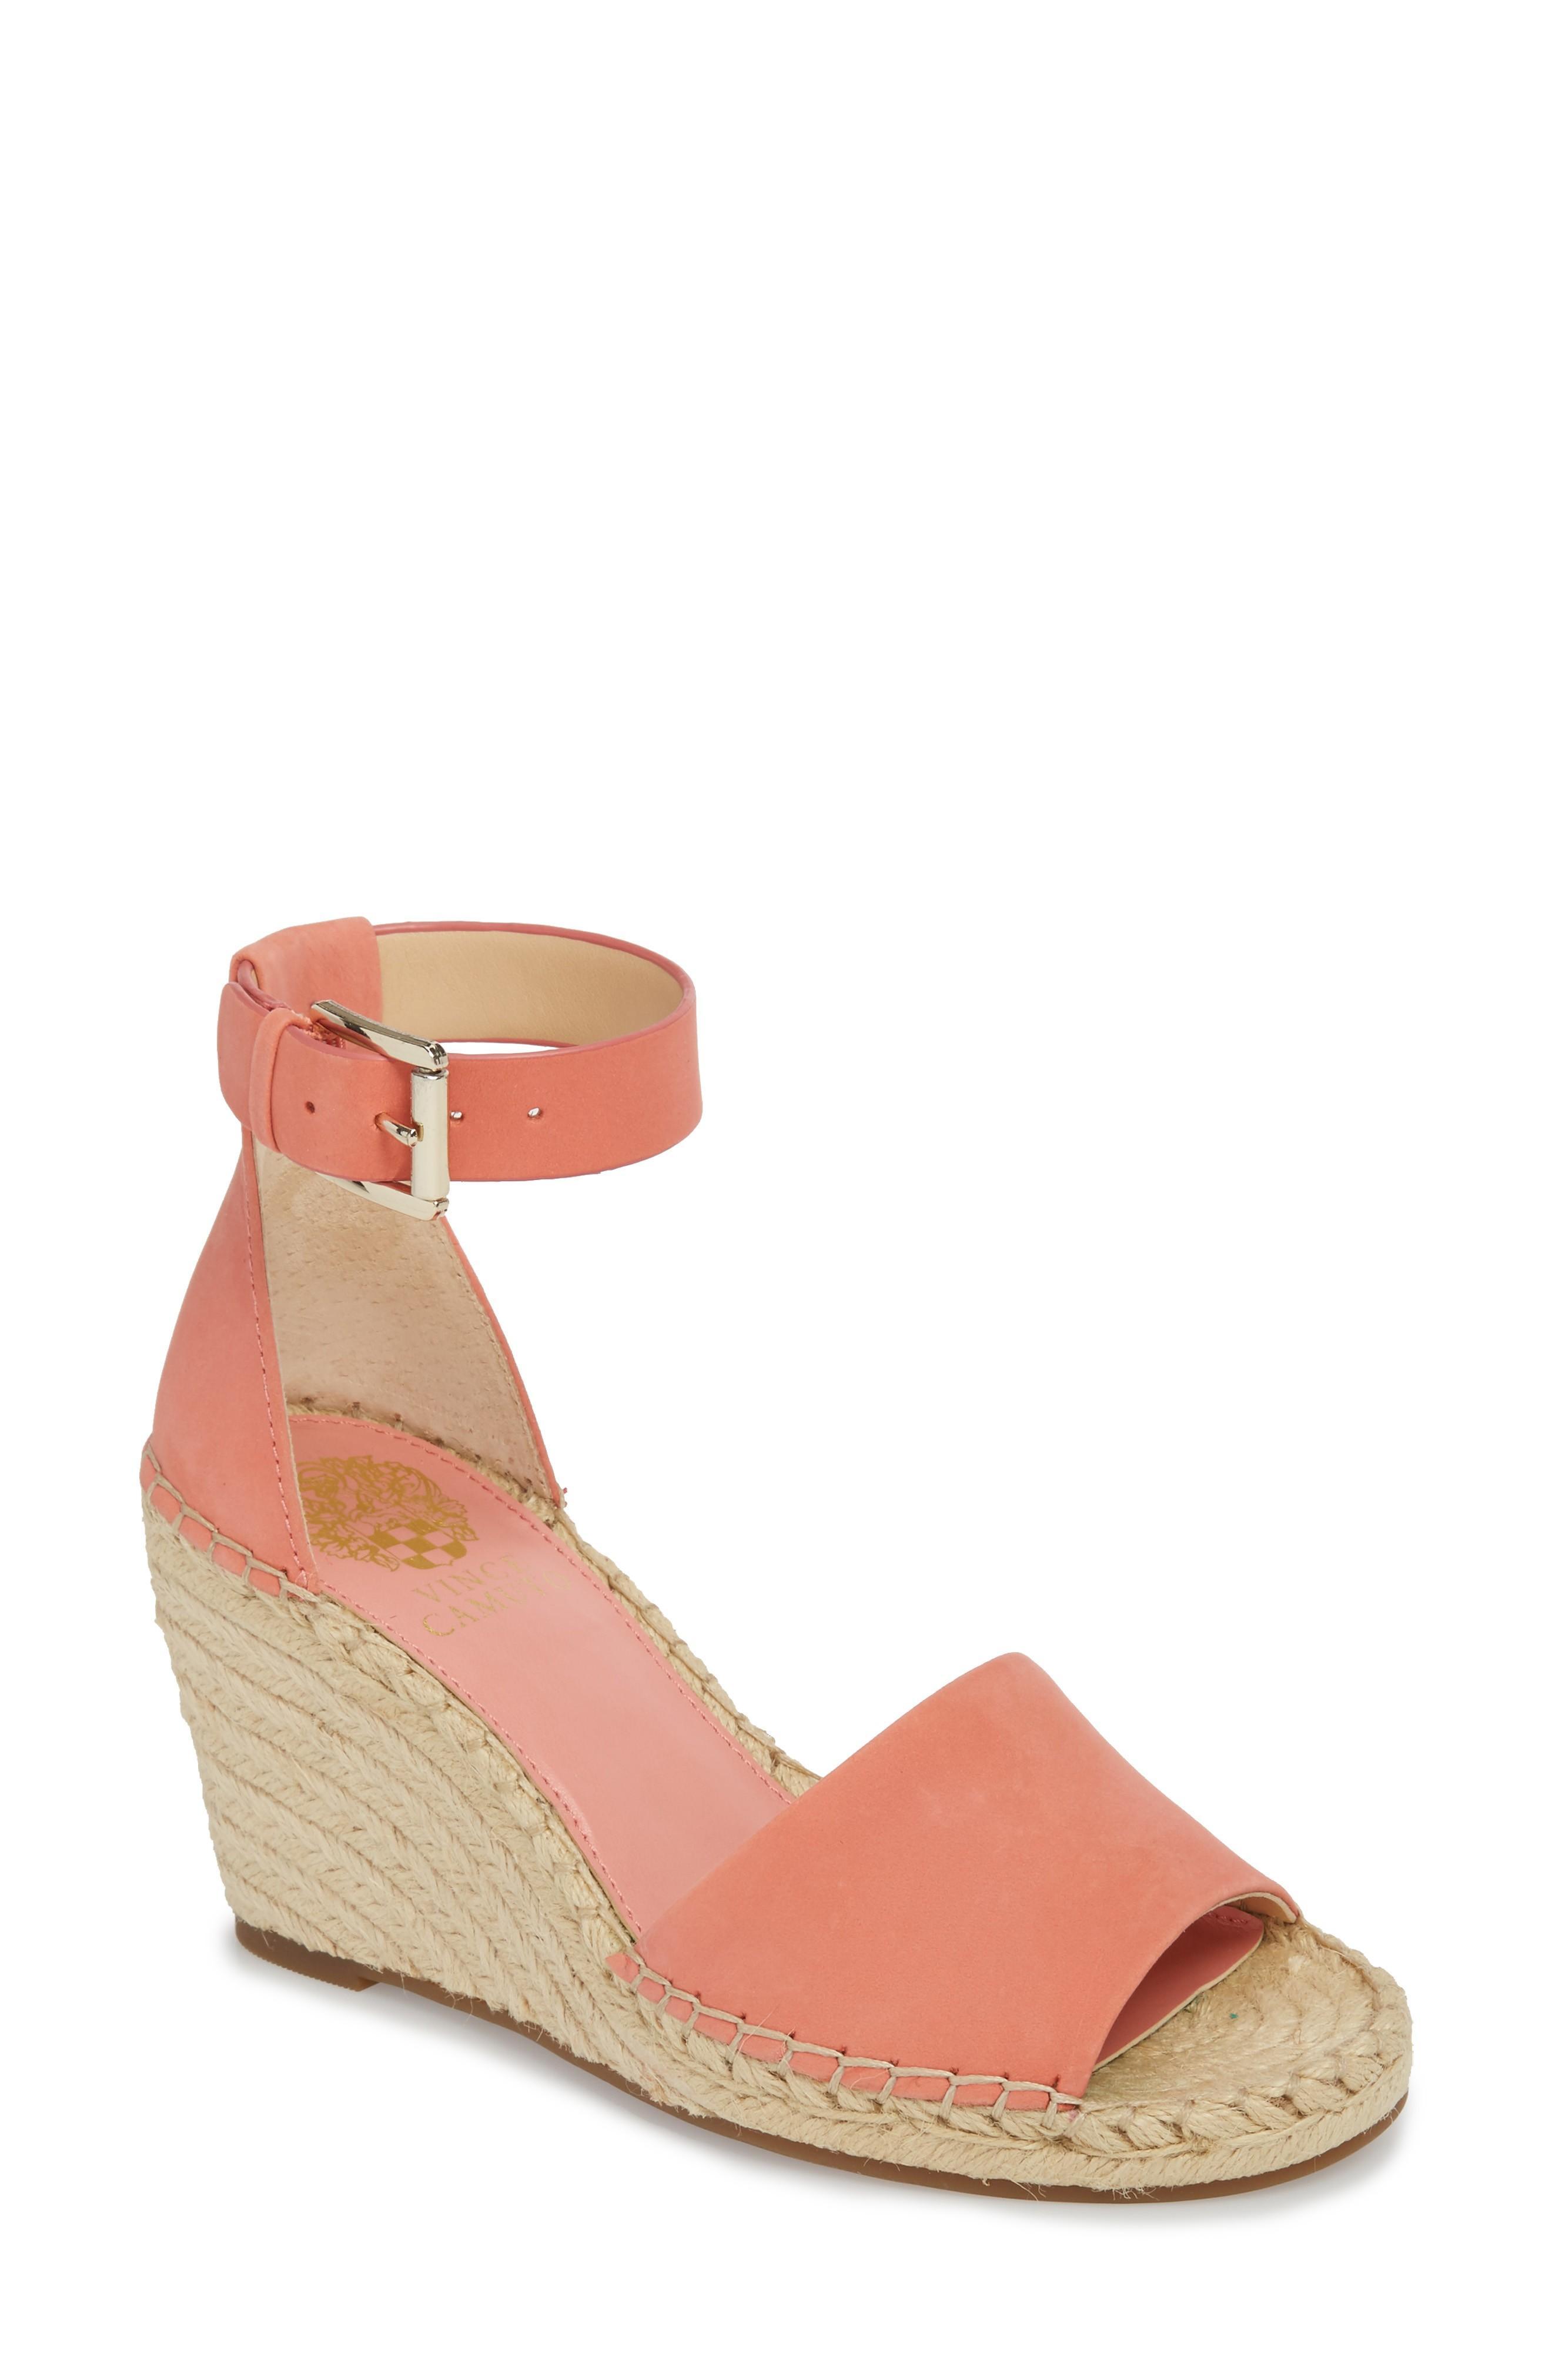 a8b036d7c43 Women's Leera Suede Espadrille Wedge Sandals in Fancy Flamingo Leather